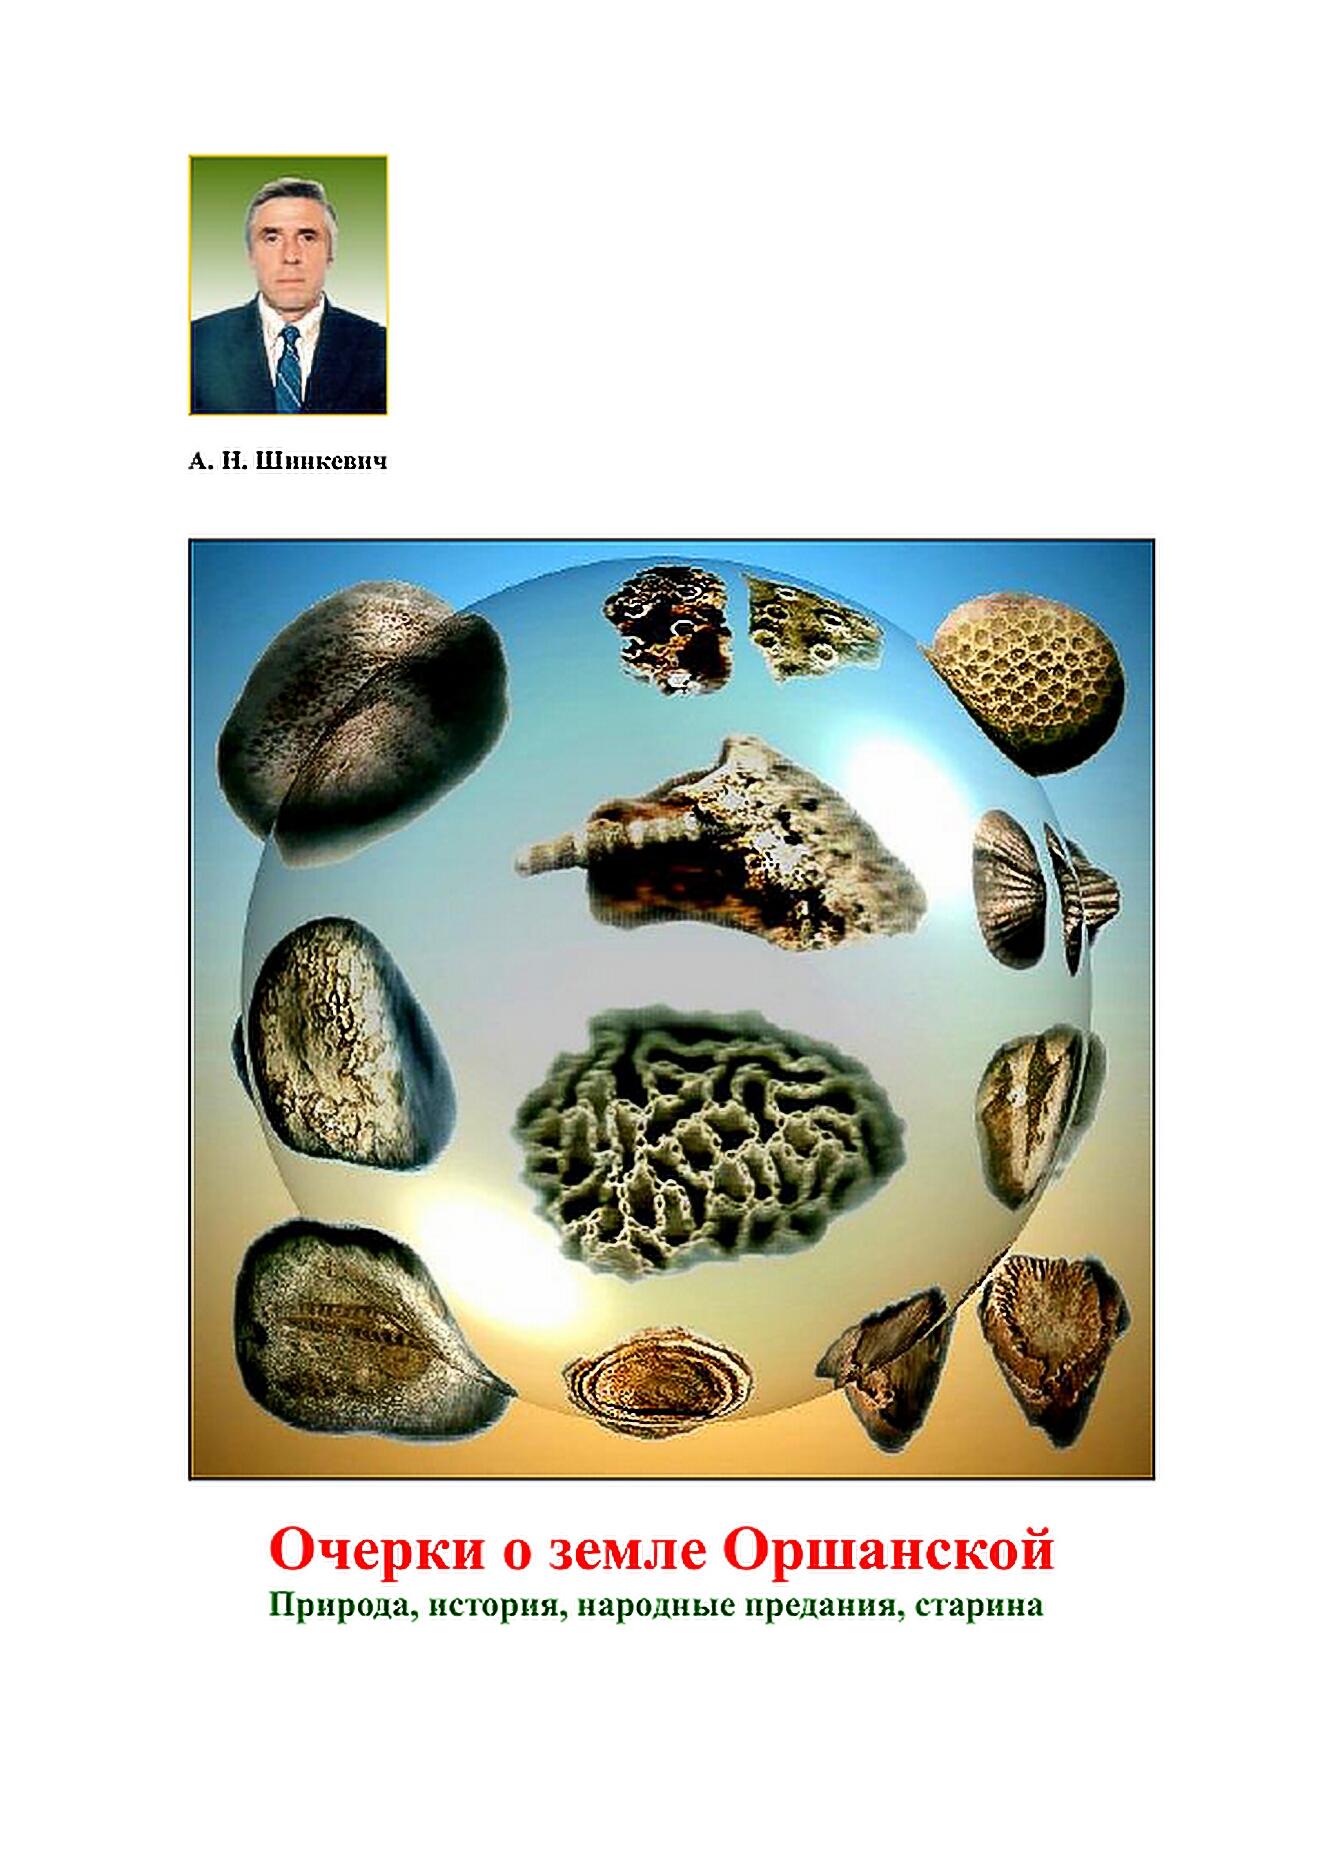 http://s5.uploads.ru/4oTSH.jpg